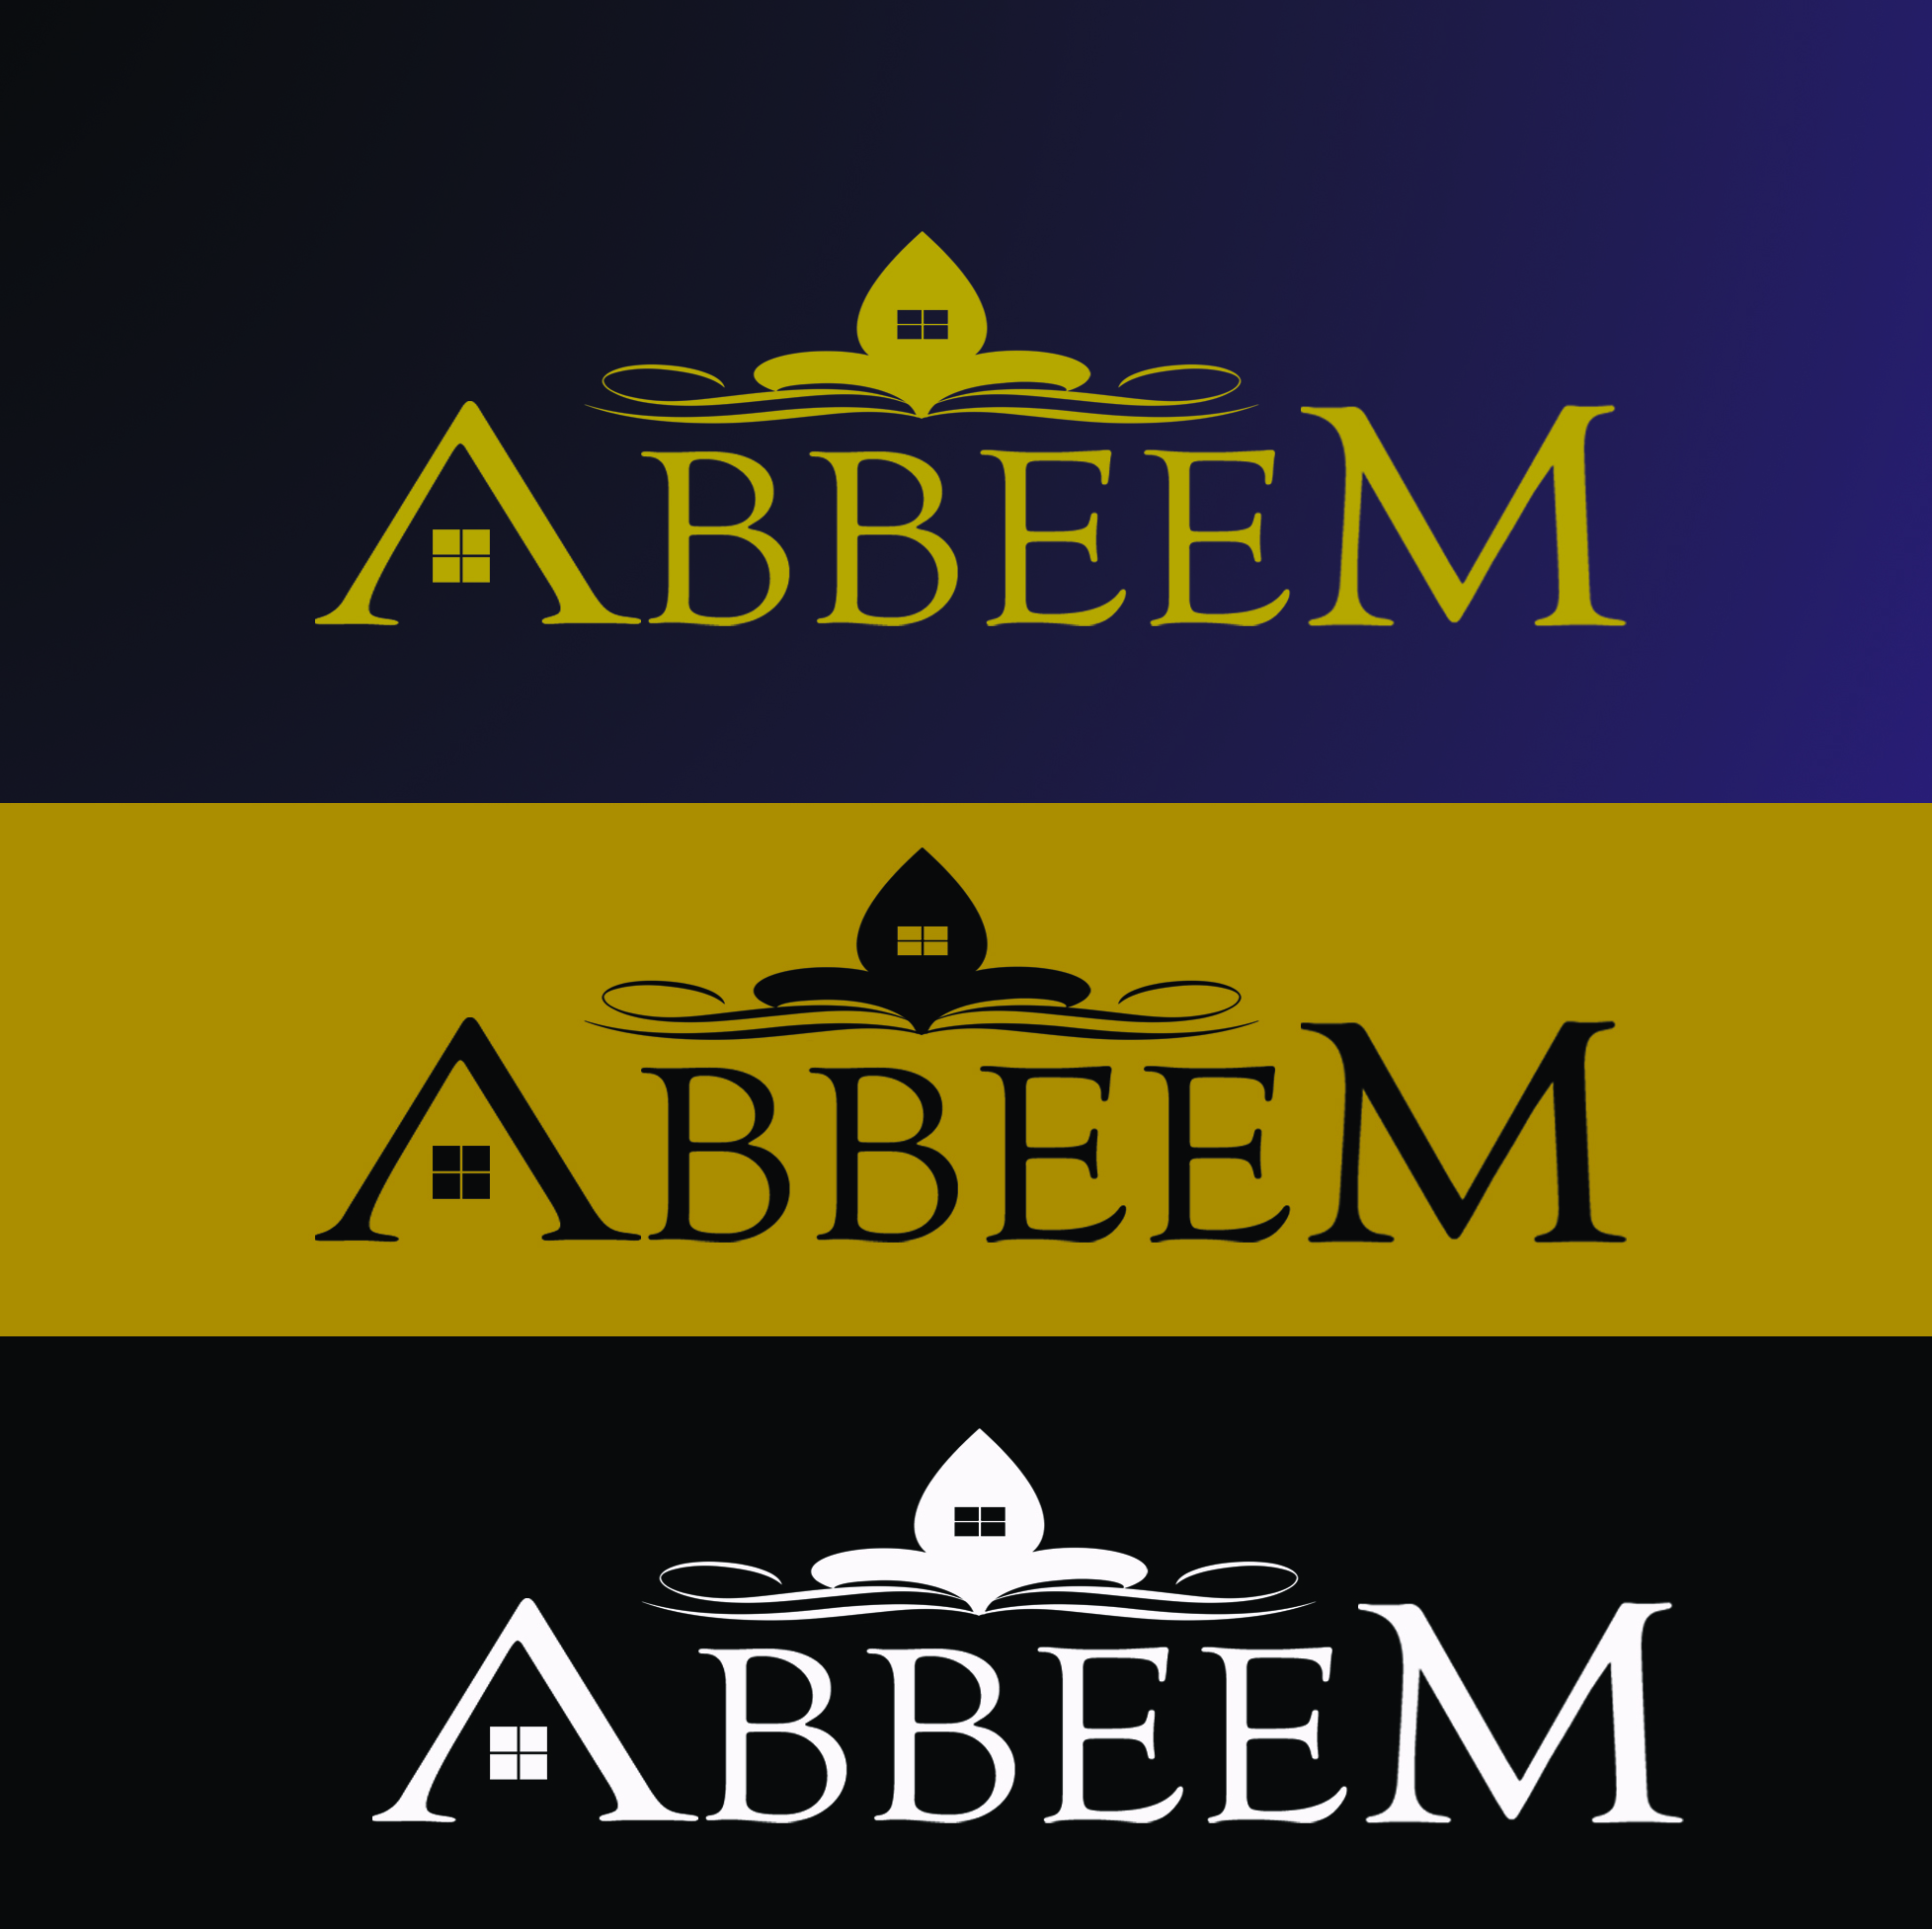 Logo Design by Arqui ACOSTA - Entry No. 103 in the Logo Design Contest Luxury Logo Design for Abbeem.